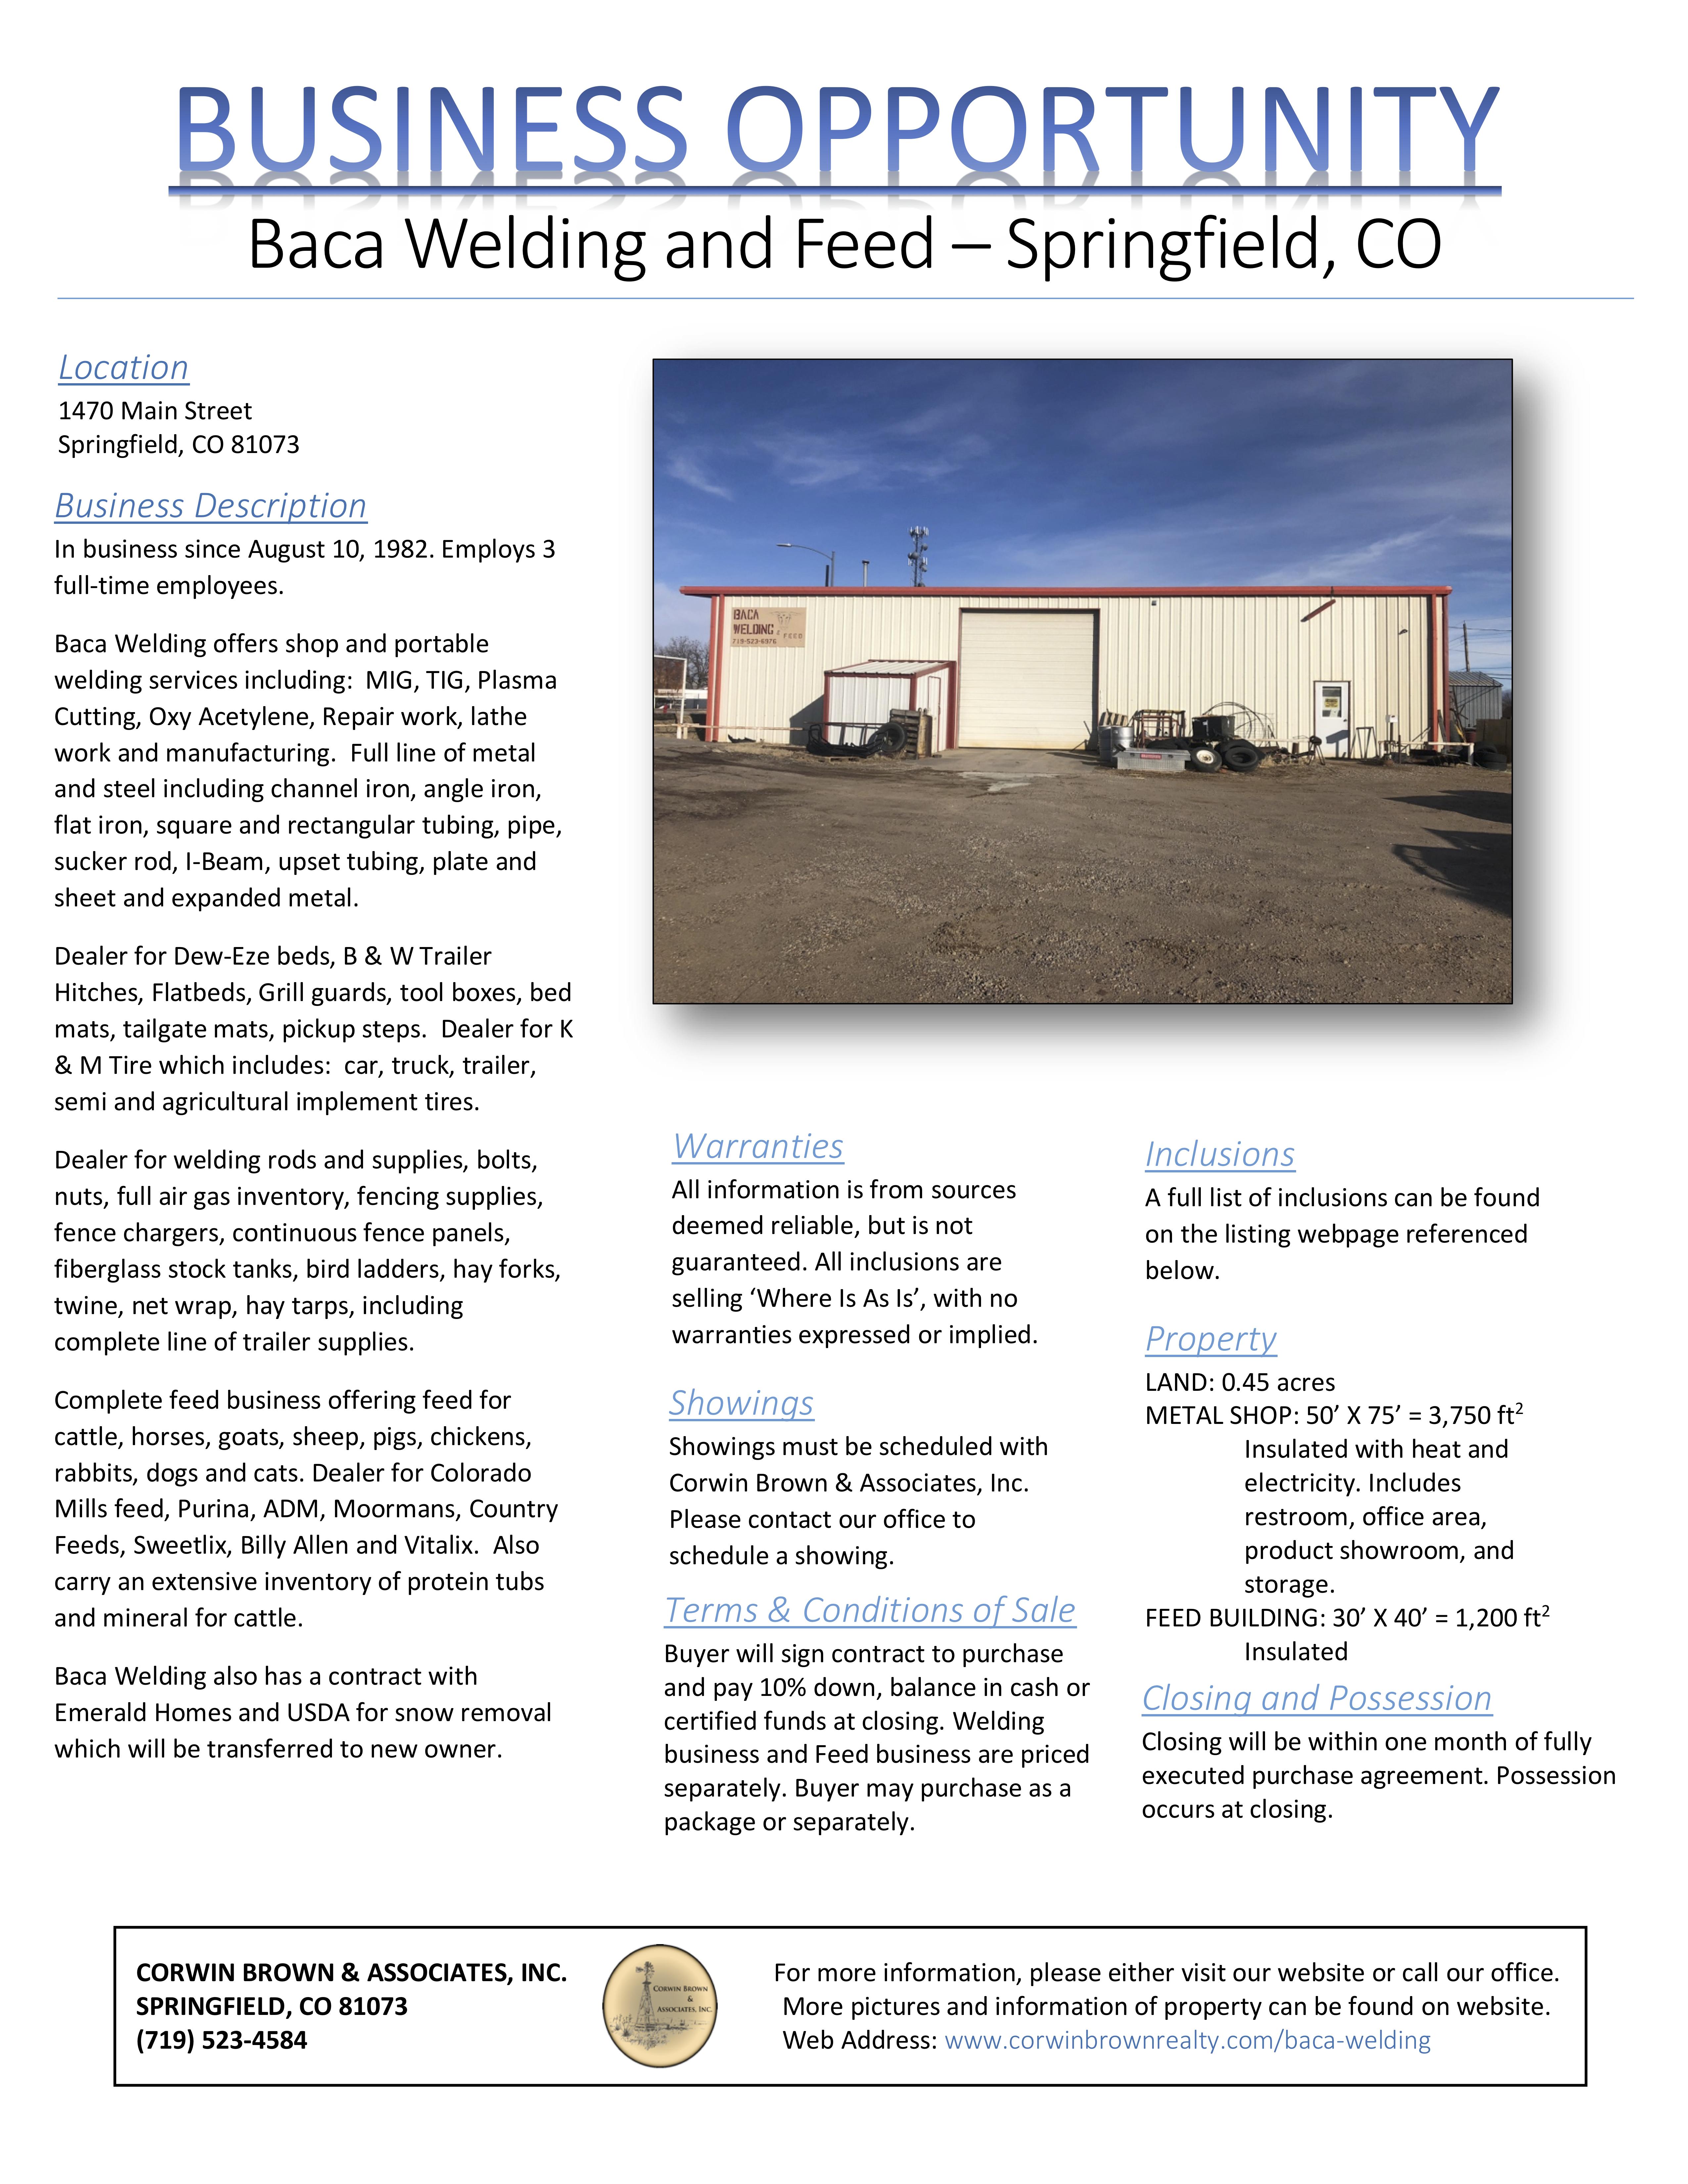 Corwin Brown Realty | Farm & Ranch Real Estate | Baca Welding